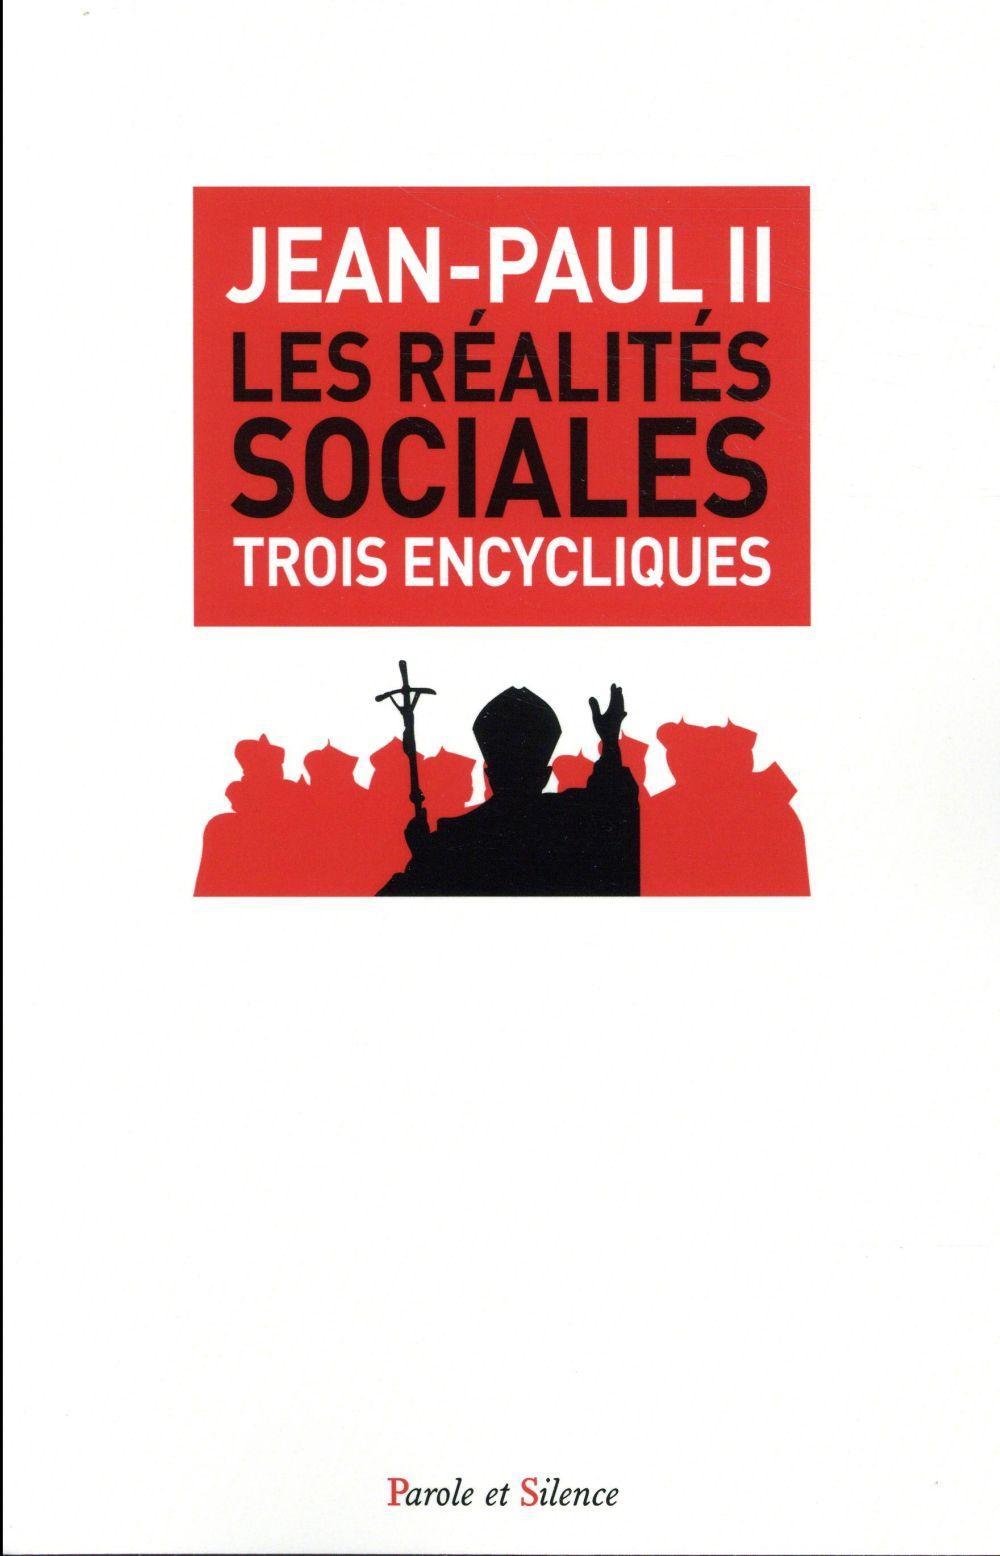 LES REALITES SOCIALES